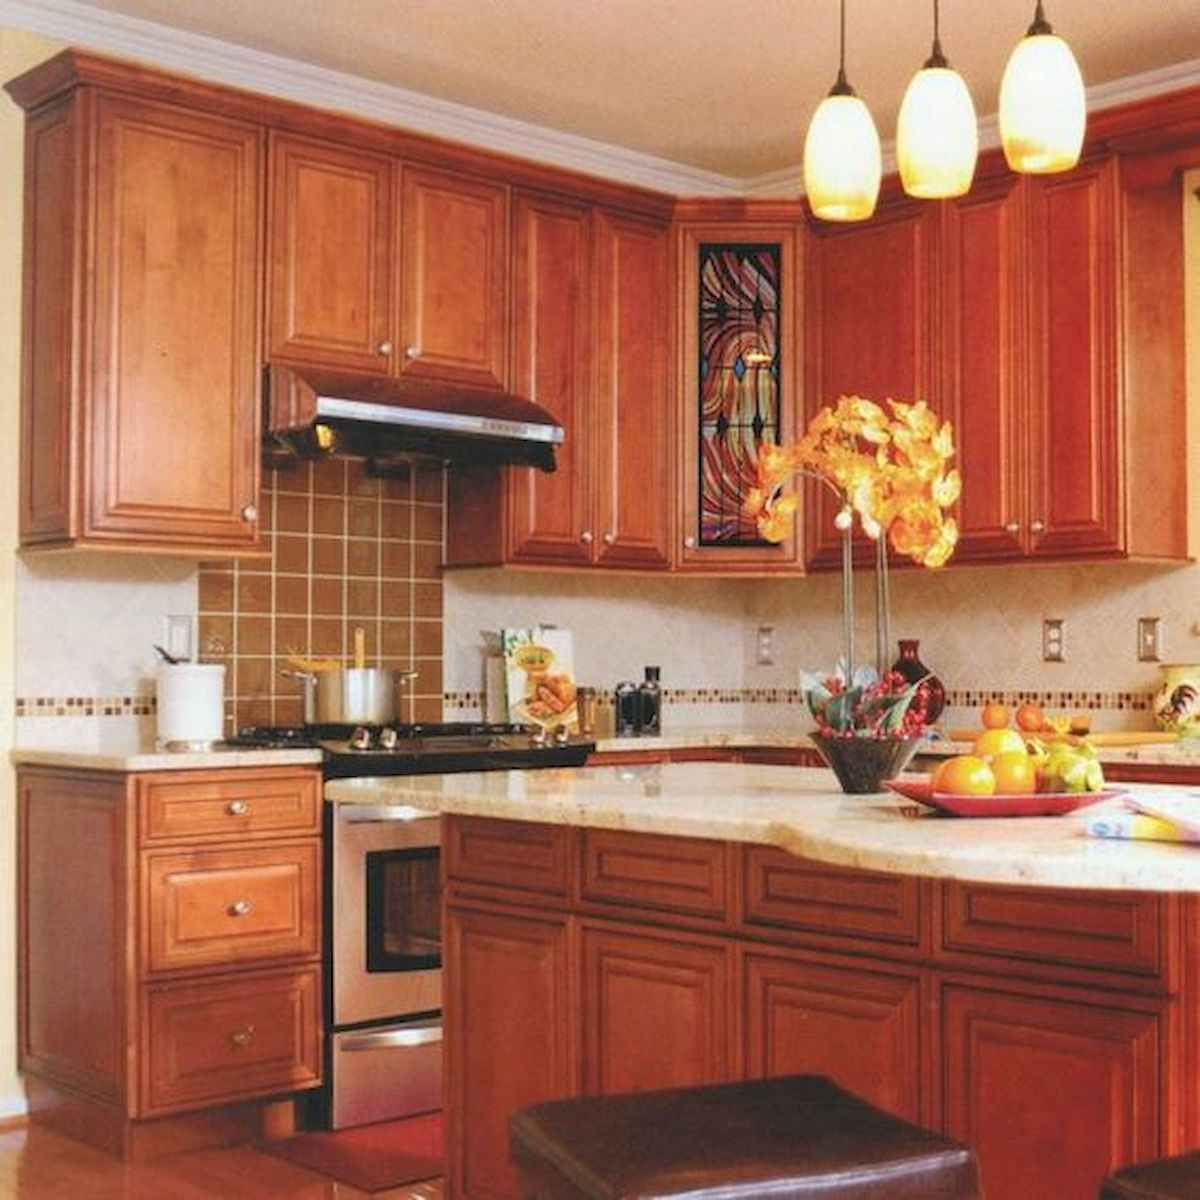 40 Awesome Craftsman Style Kitchen Design Ideas 21 Tuscan Kitchen Kitchen Design Kitchen Wall Cabinets